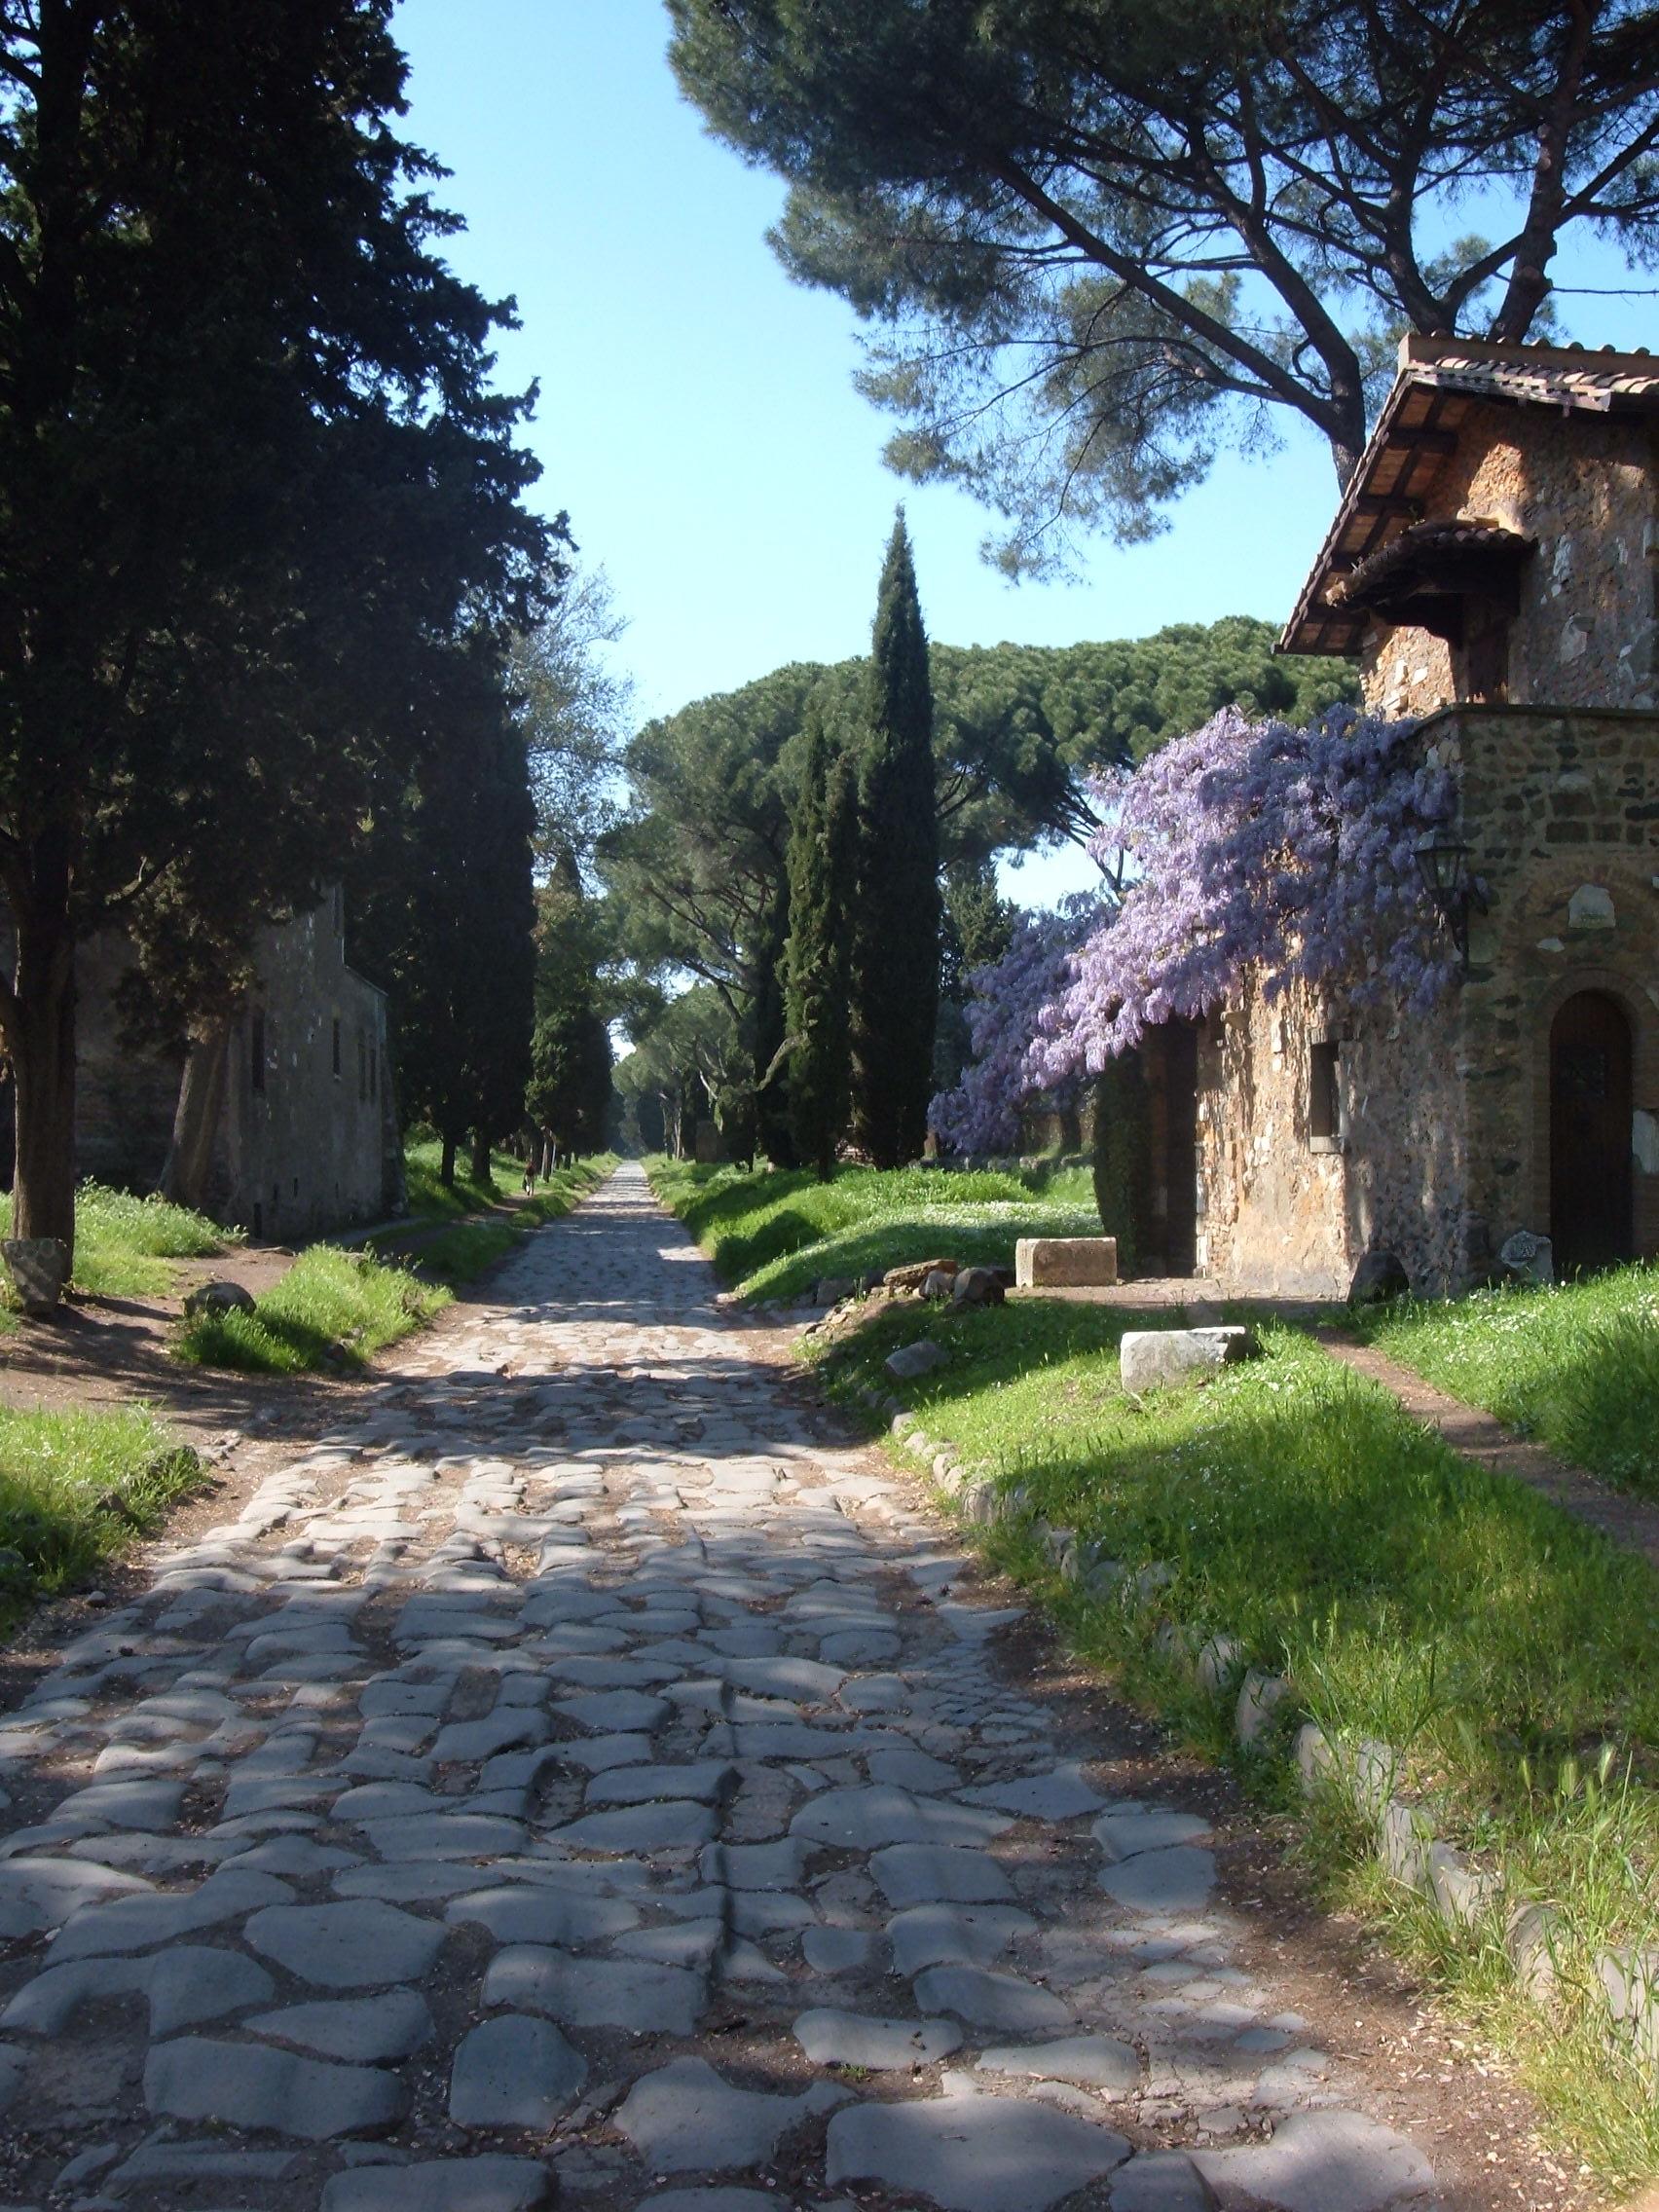 Appian Way and Aqueducts Park [object object] - Via appia - Visita Roma en dos días, tour de Roma